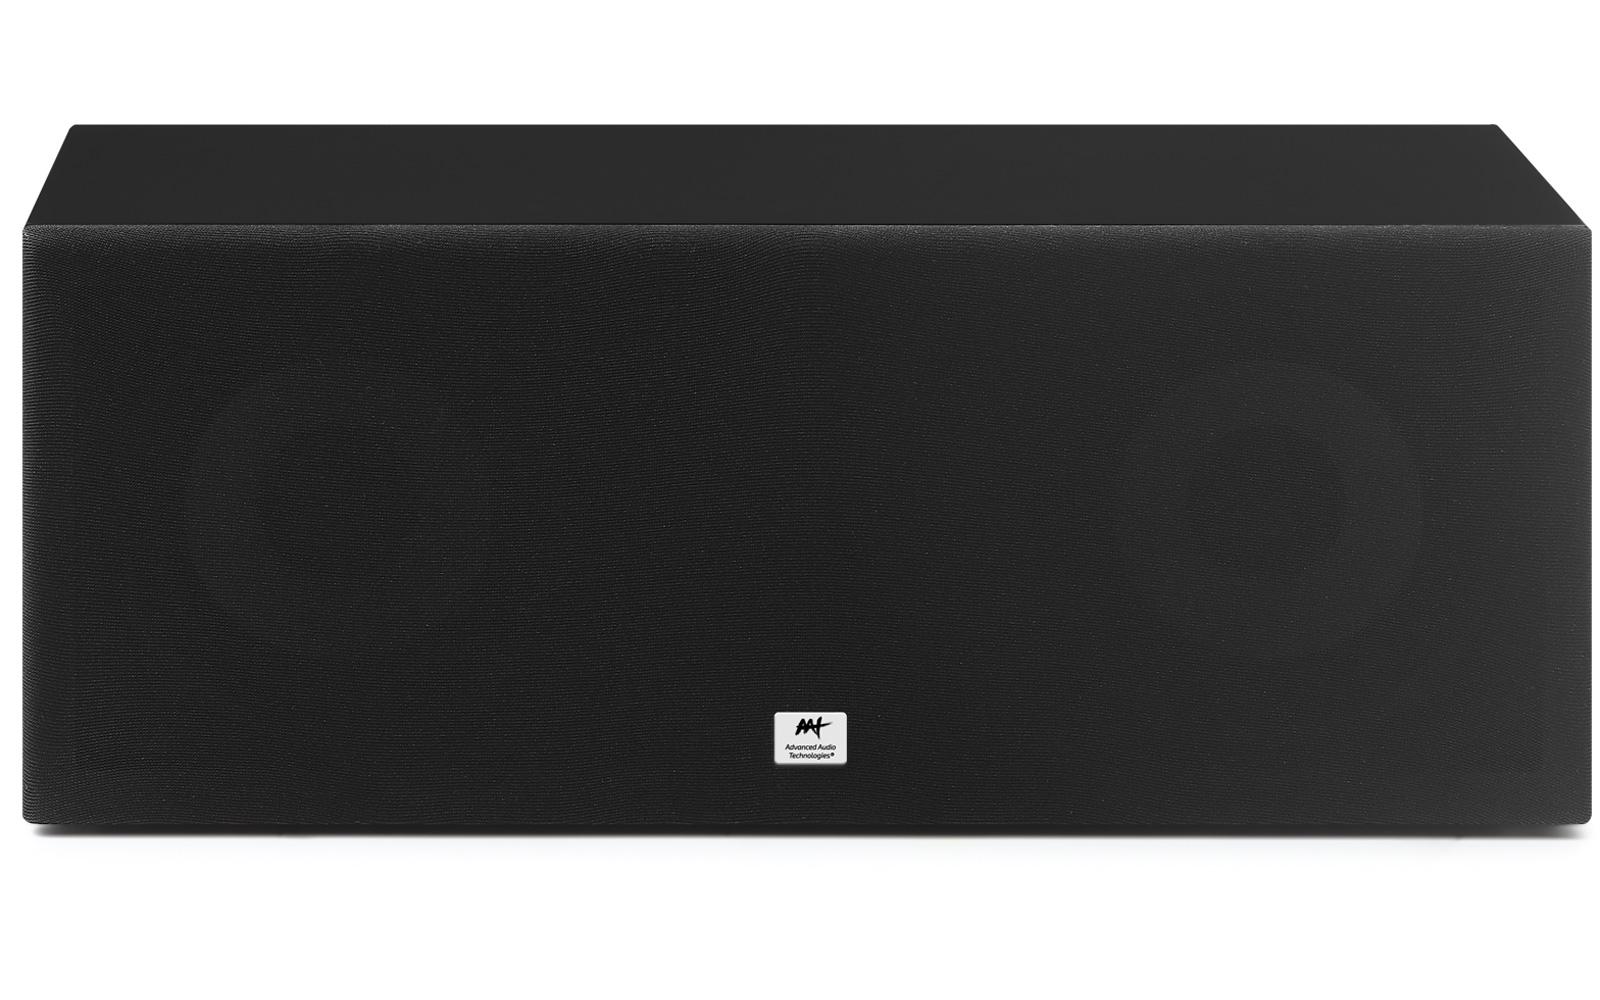 AAT RAKT C140 - Caixa Acustica Central 140Wrms Pretas  - Audio Video & cia